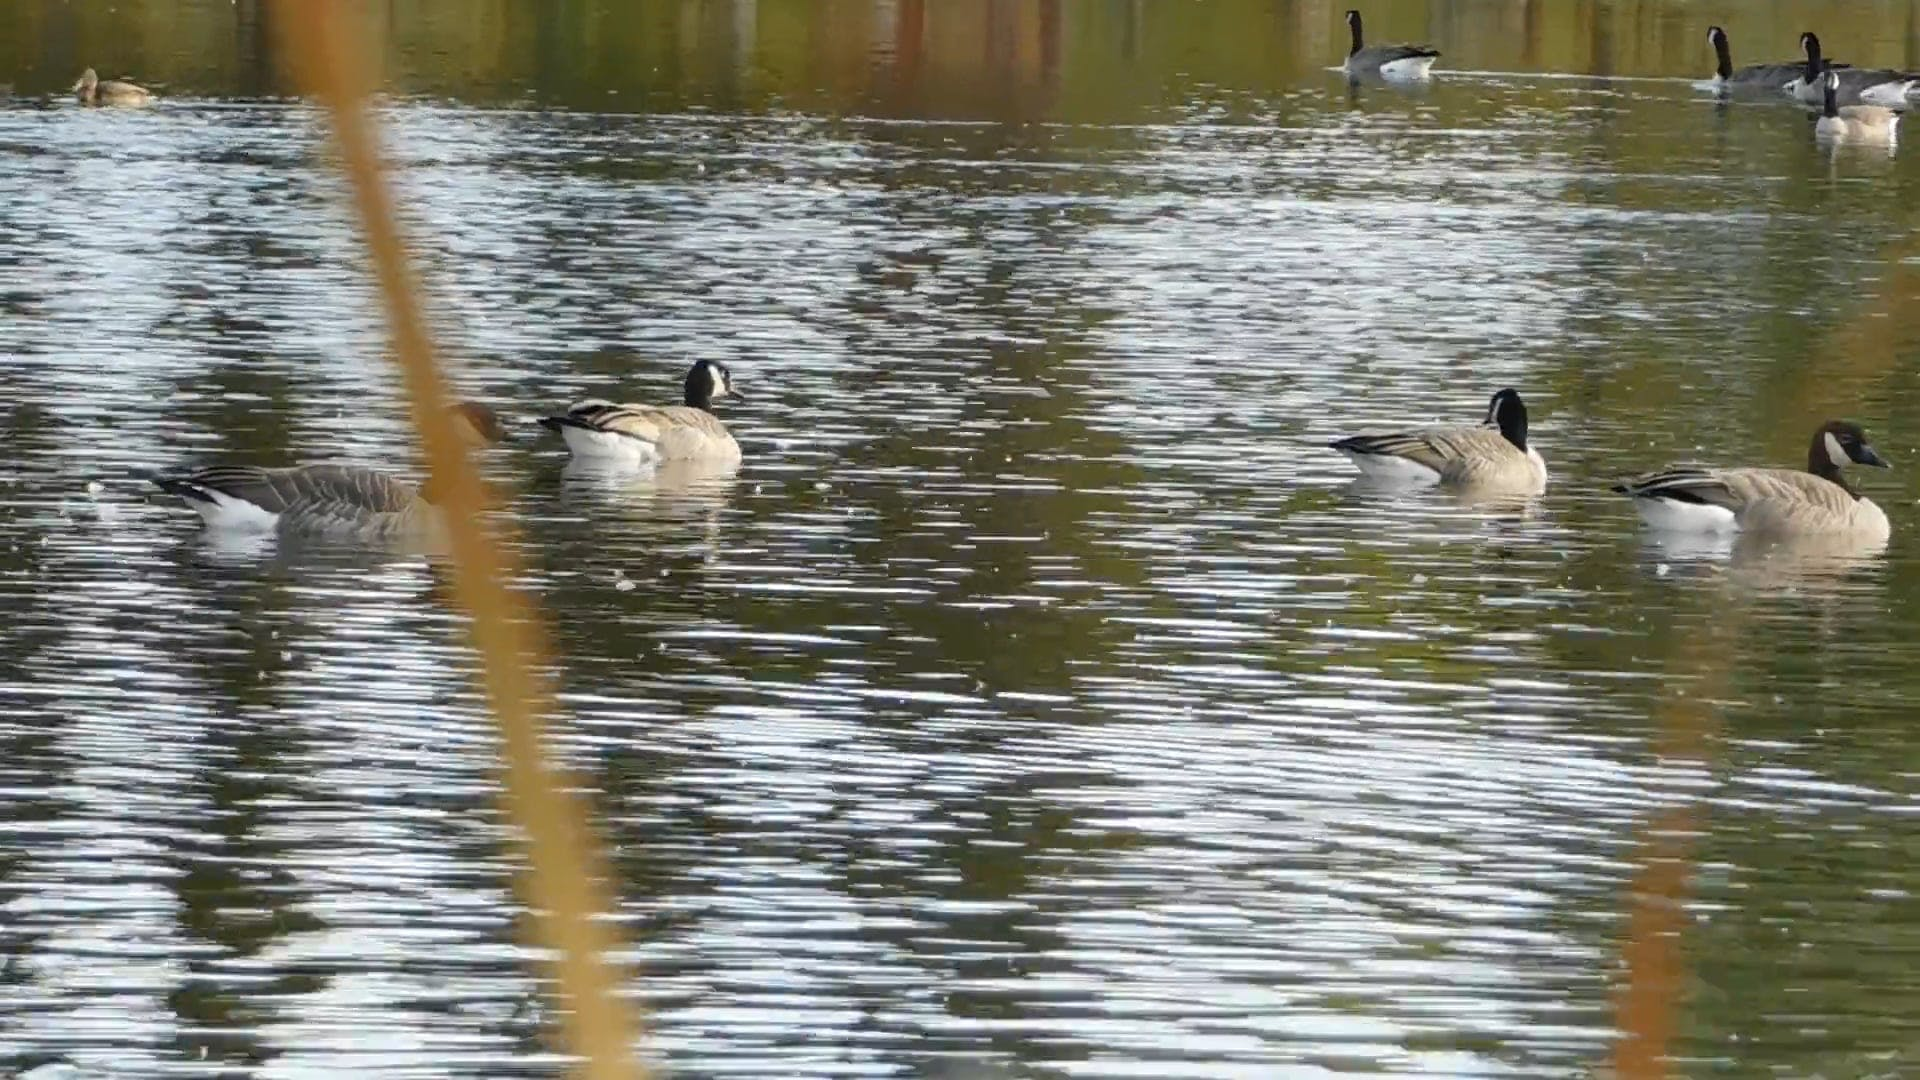 Beautiful Sight Of Ducks In The Lake